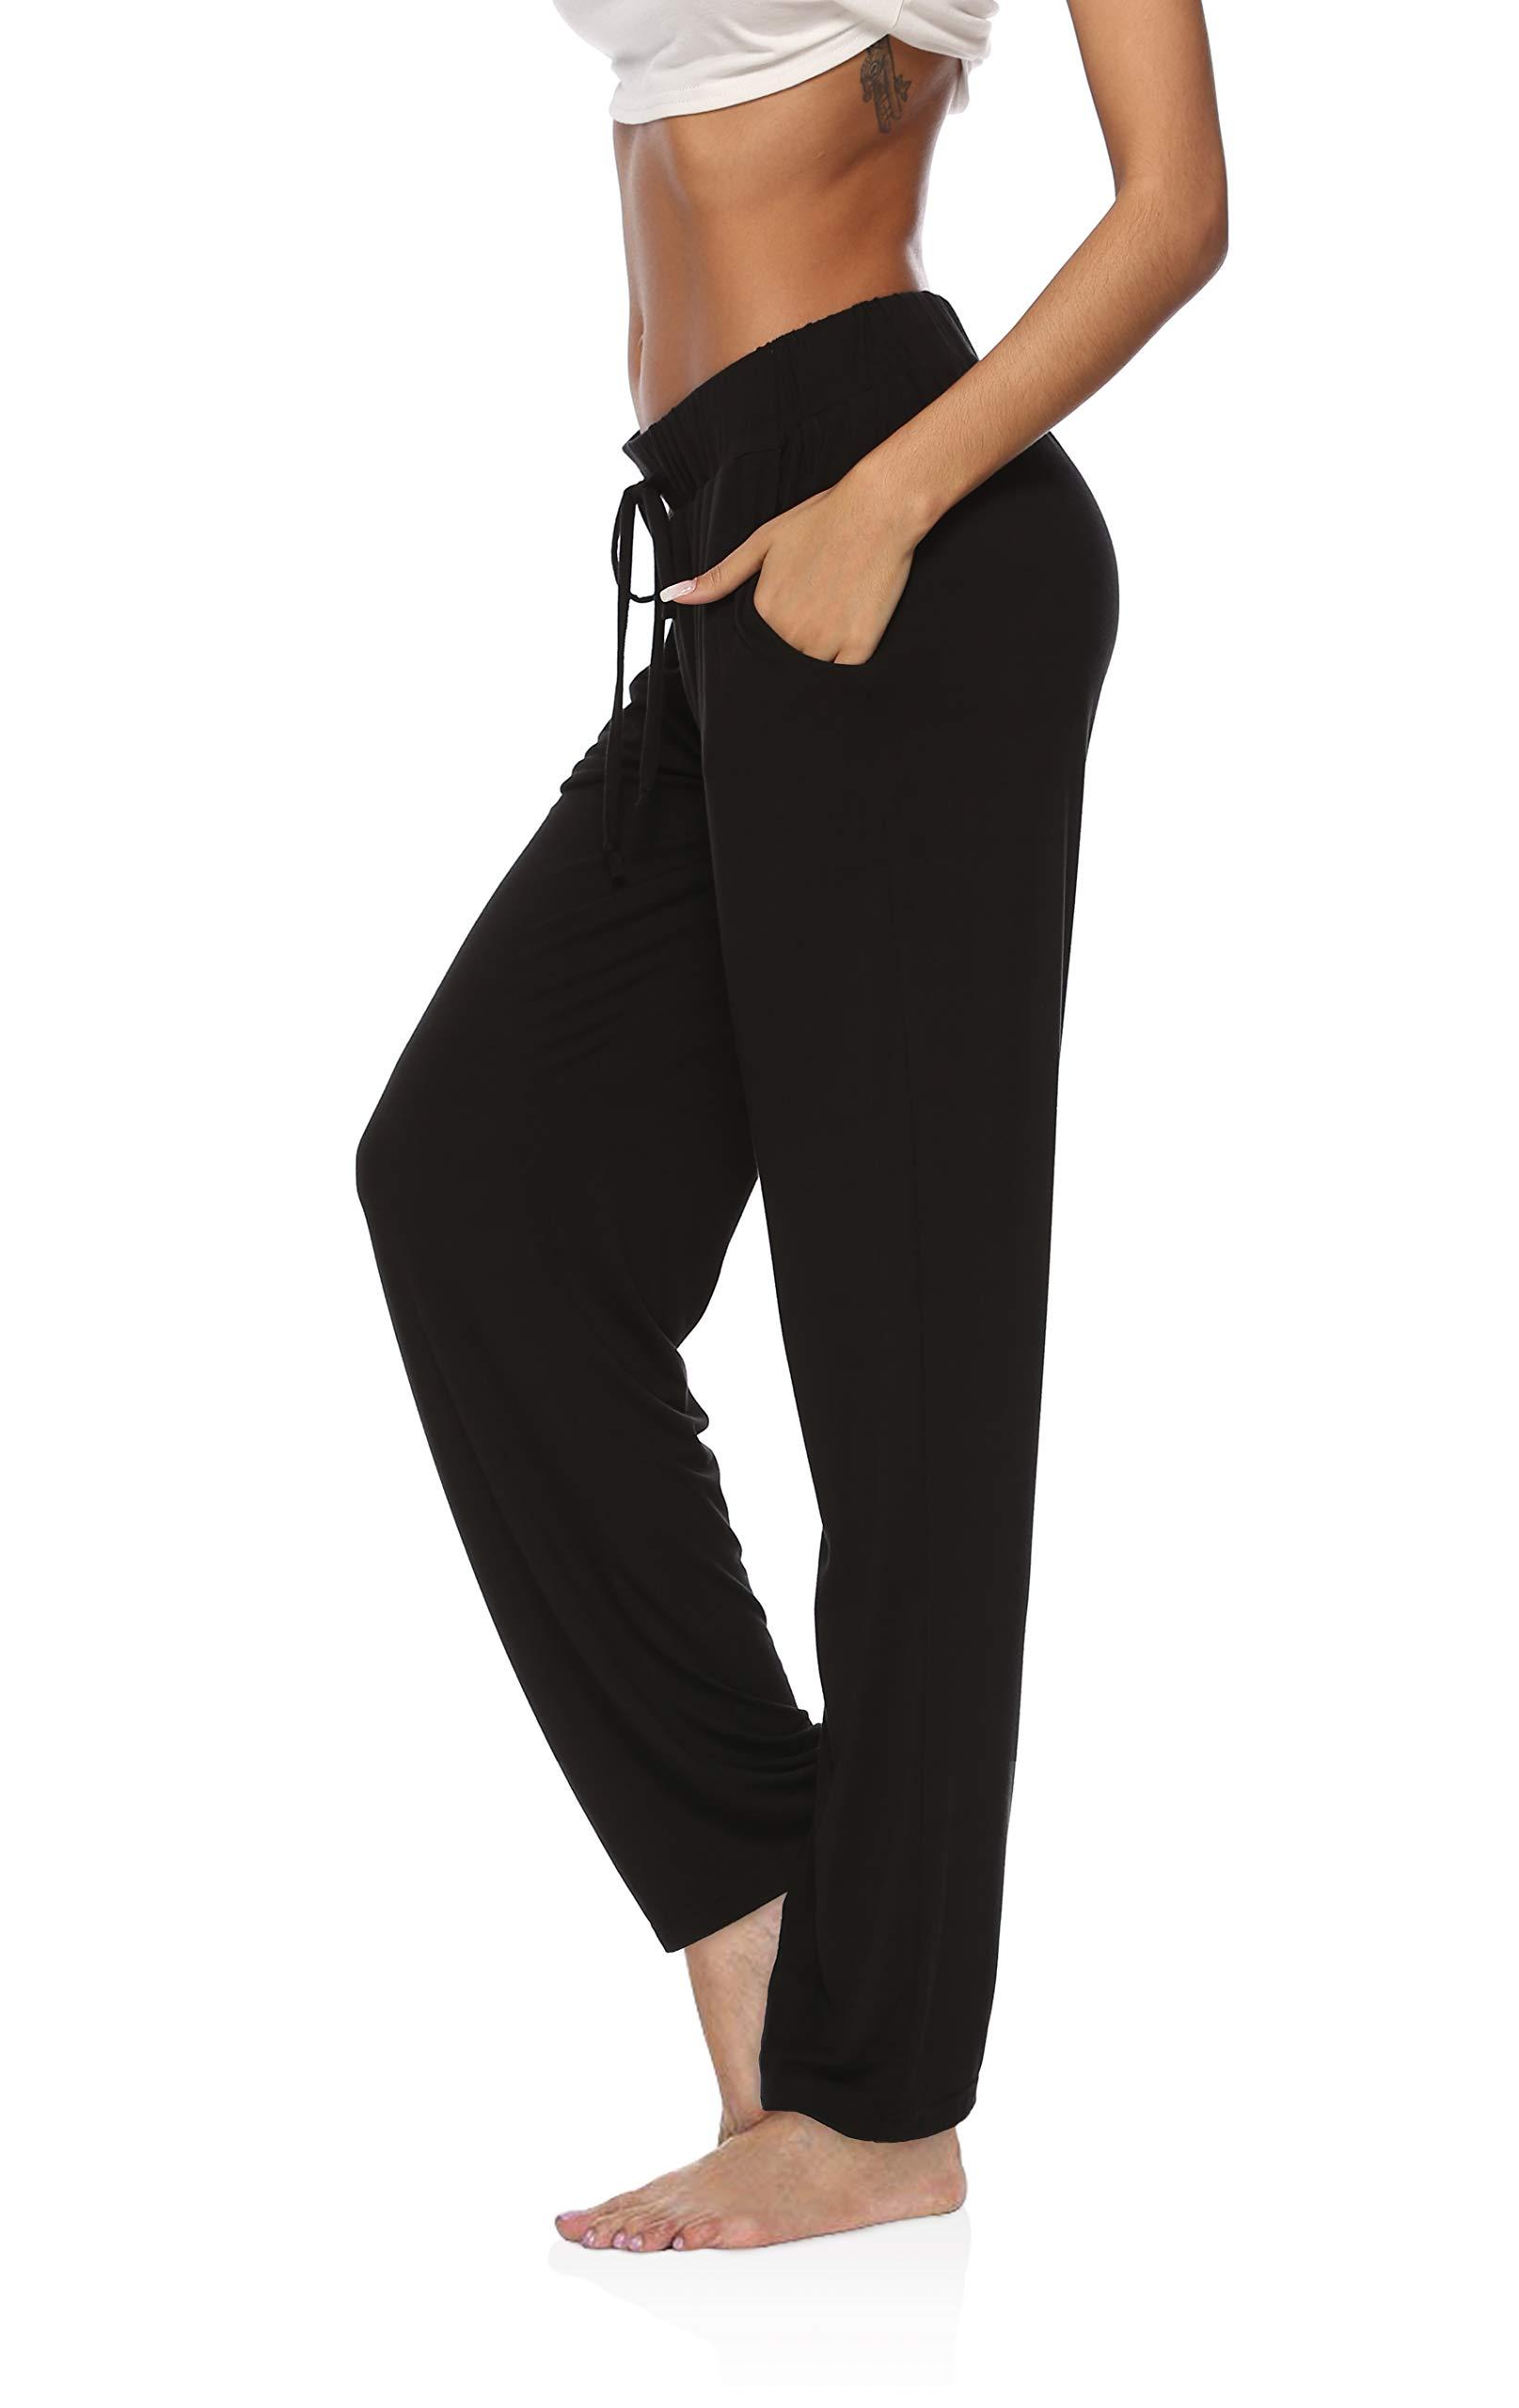 DIBAOLONG Womens Yoga Pants Wide Leg Comfy Drawstring Loose Straight Lounge Running Workout Legging A1-Black L by DIBAOLONG